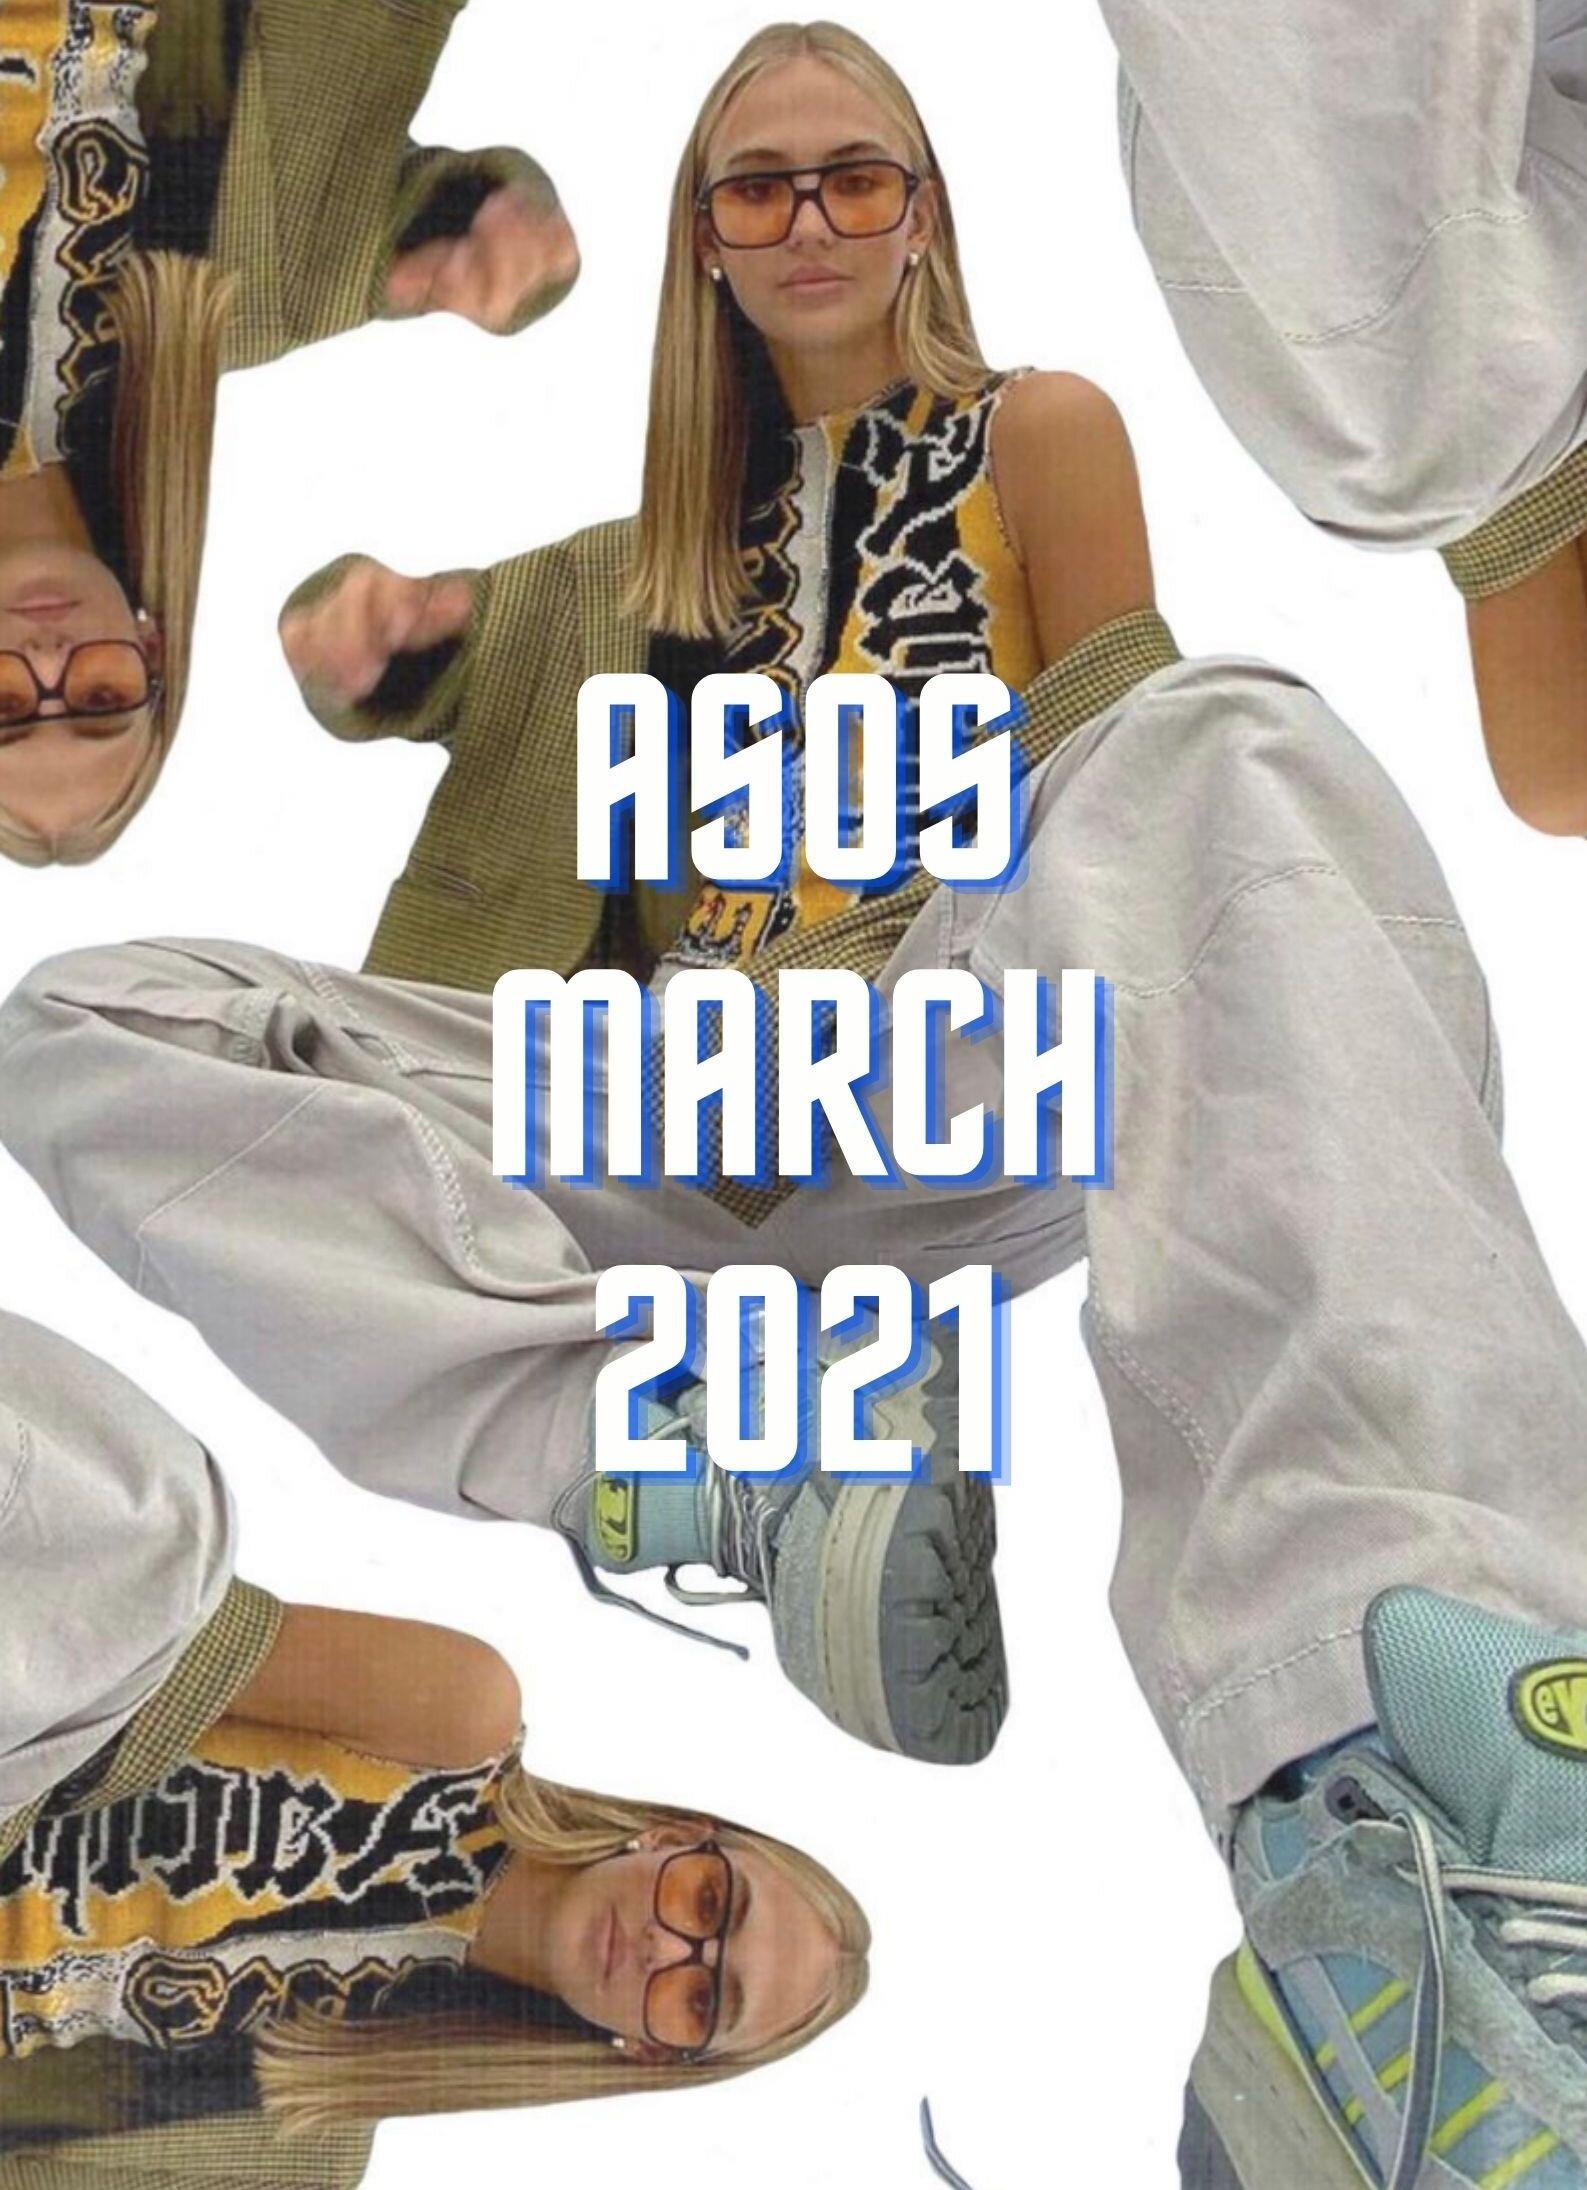 - ASOS:+January 2021 picks: Here. (20 ITEMS)+February 2021 picks: Here. (20 ITEMS)+April 2021 picks: Here. (20 ITEMS)